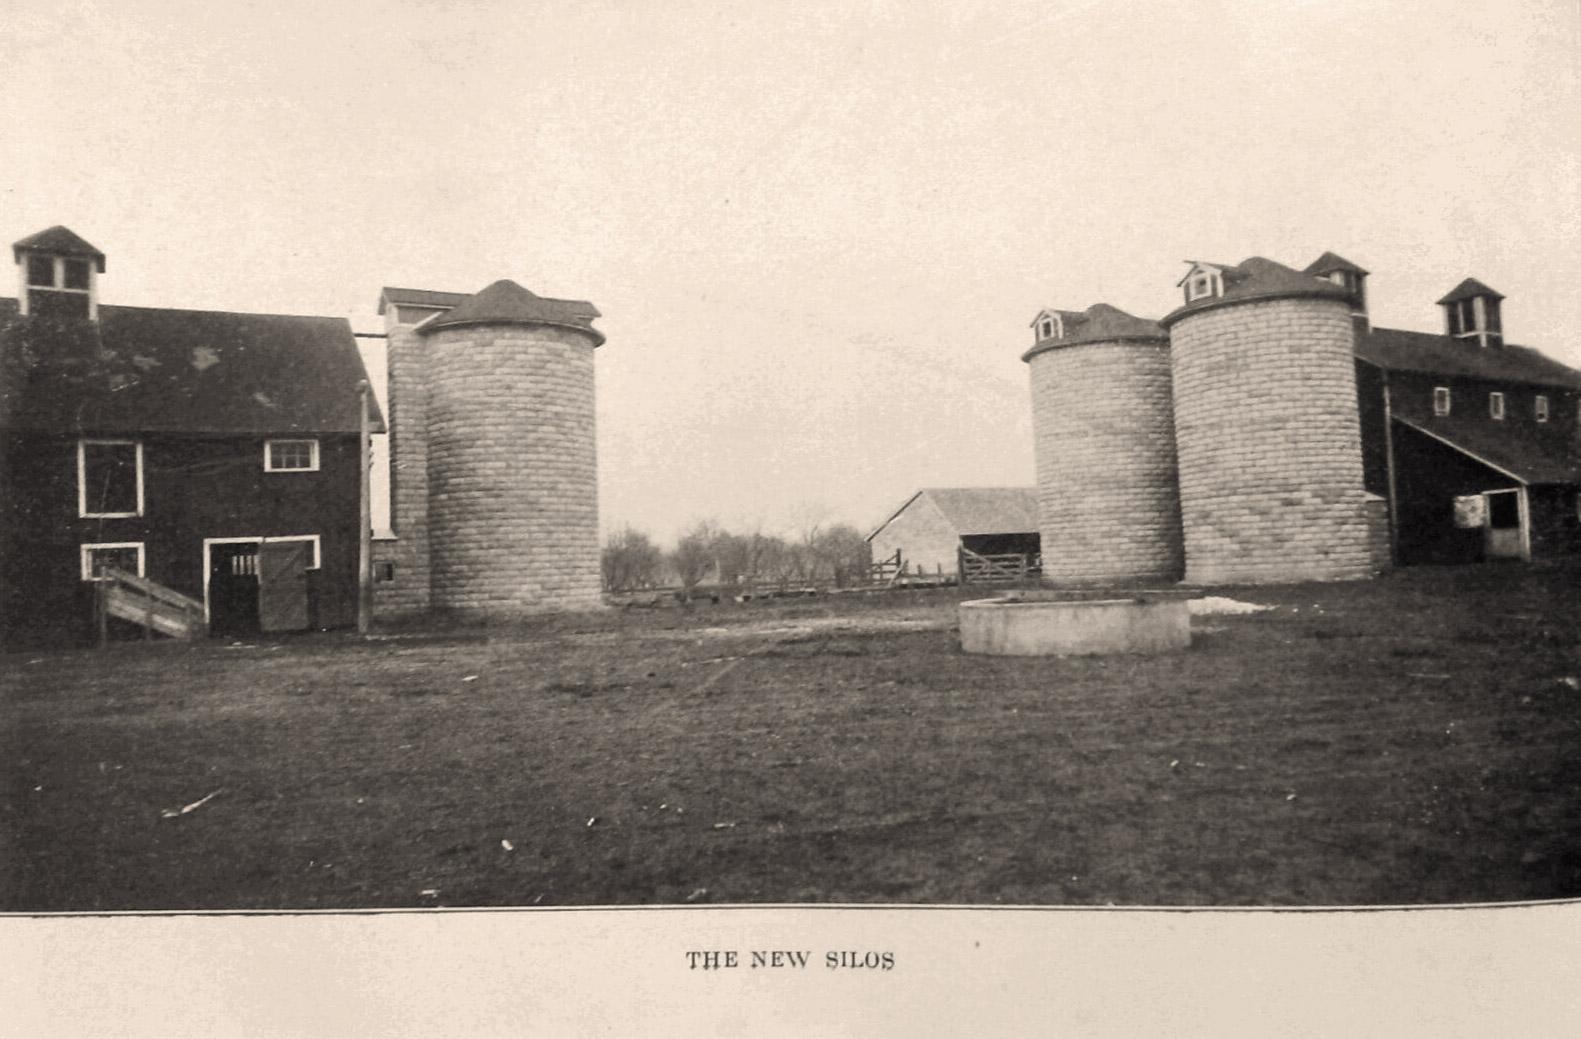 Silos at farm, Illinois State Reformatory